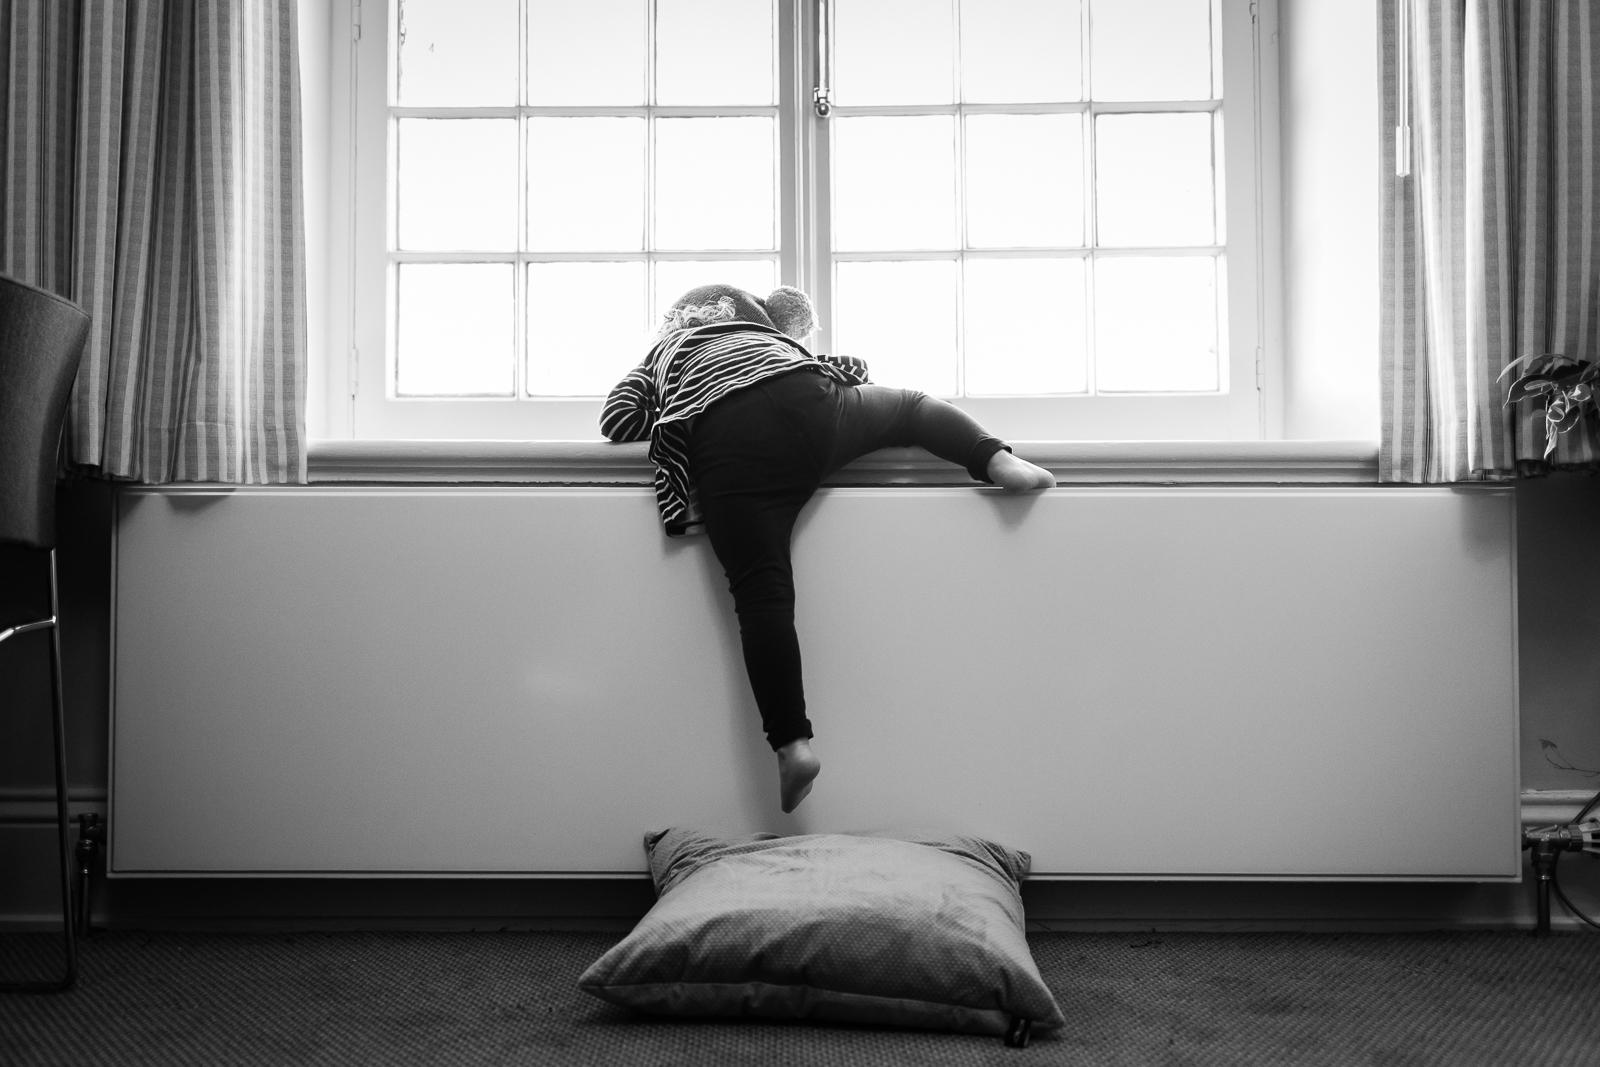 Alice-Chapman-Photography-Blog-050319-7.jpg